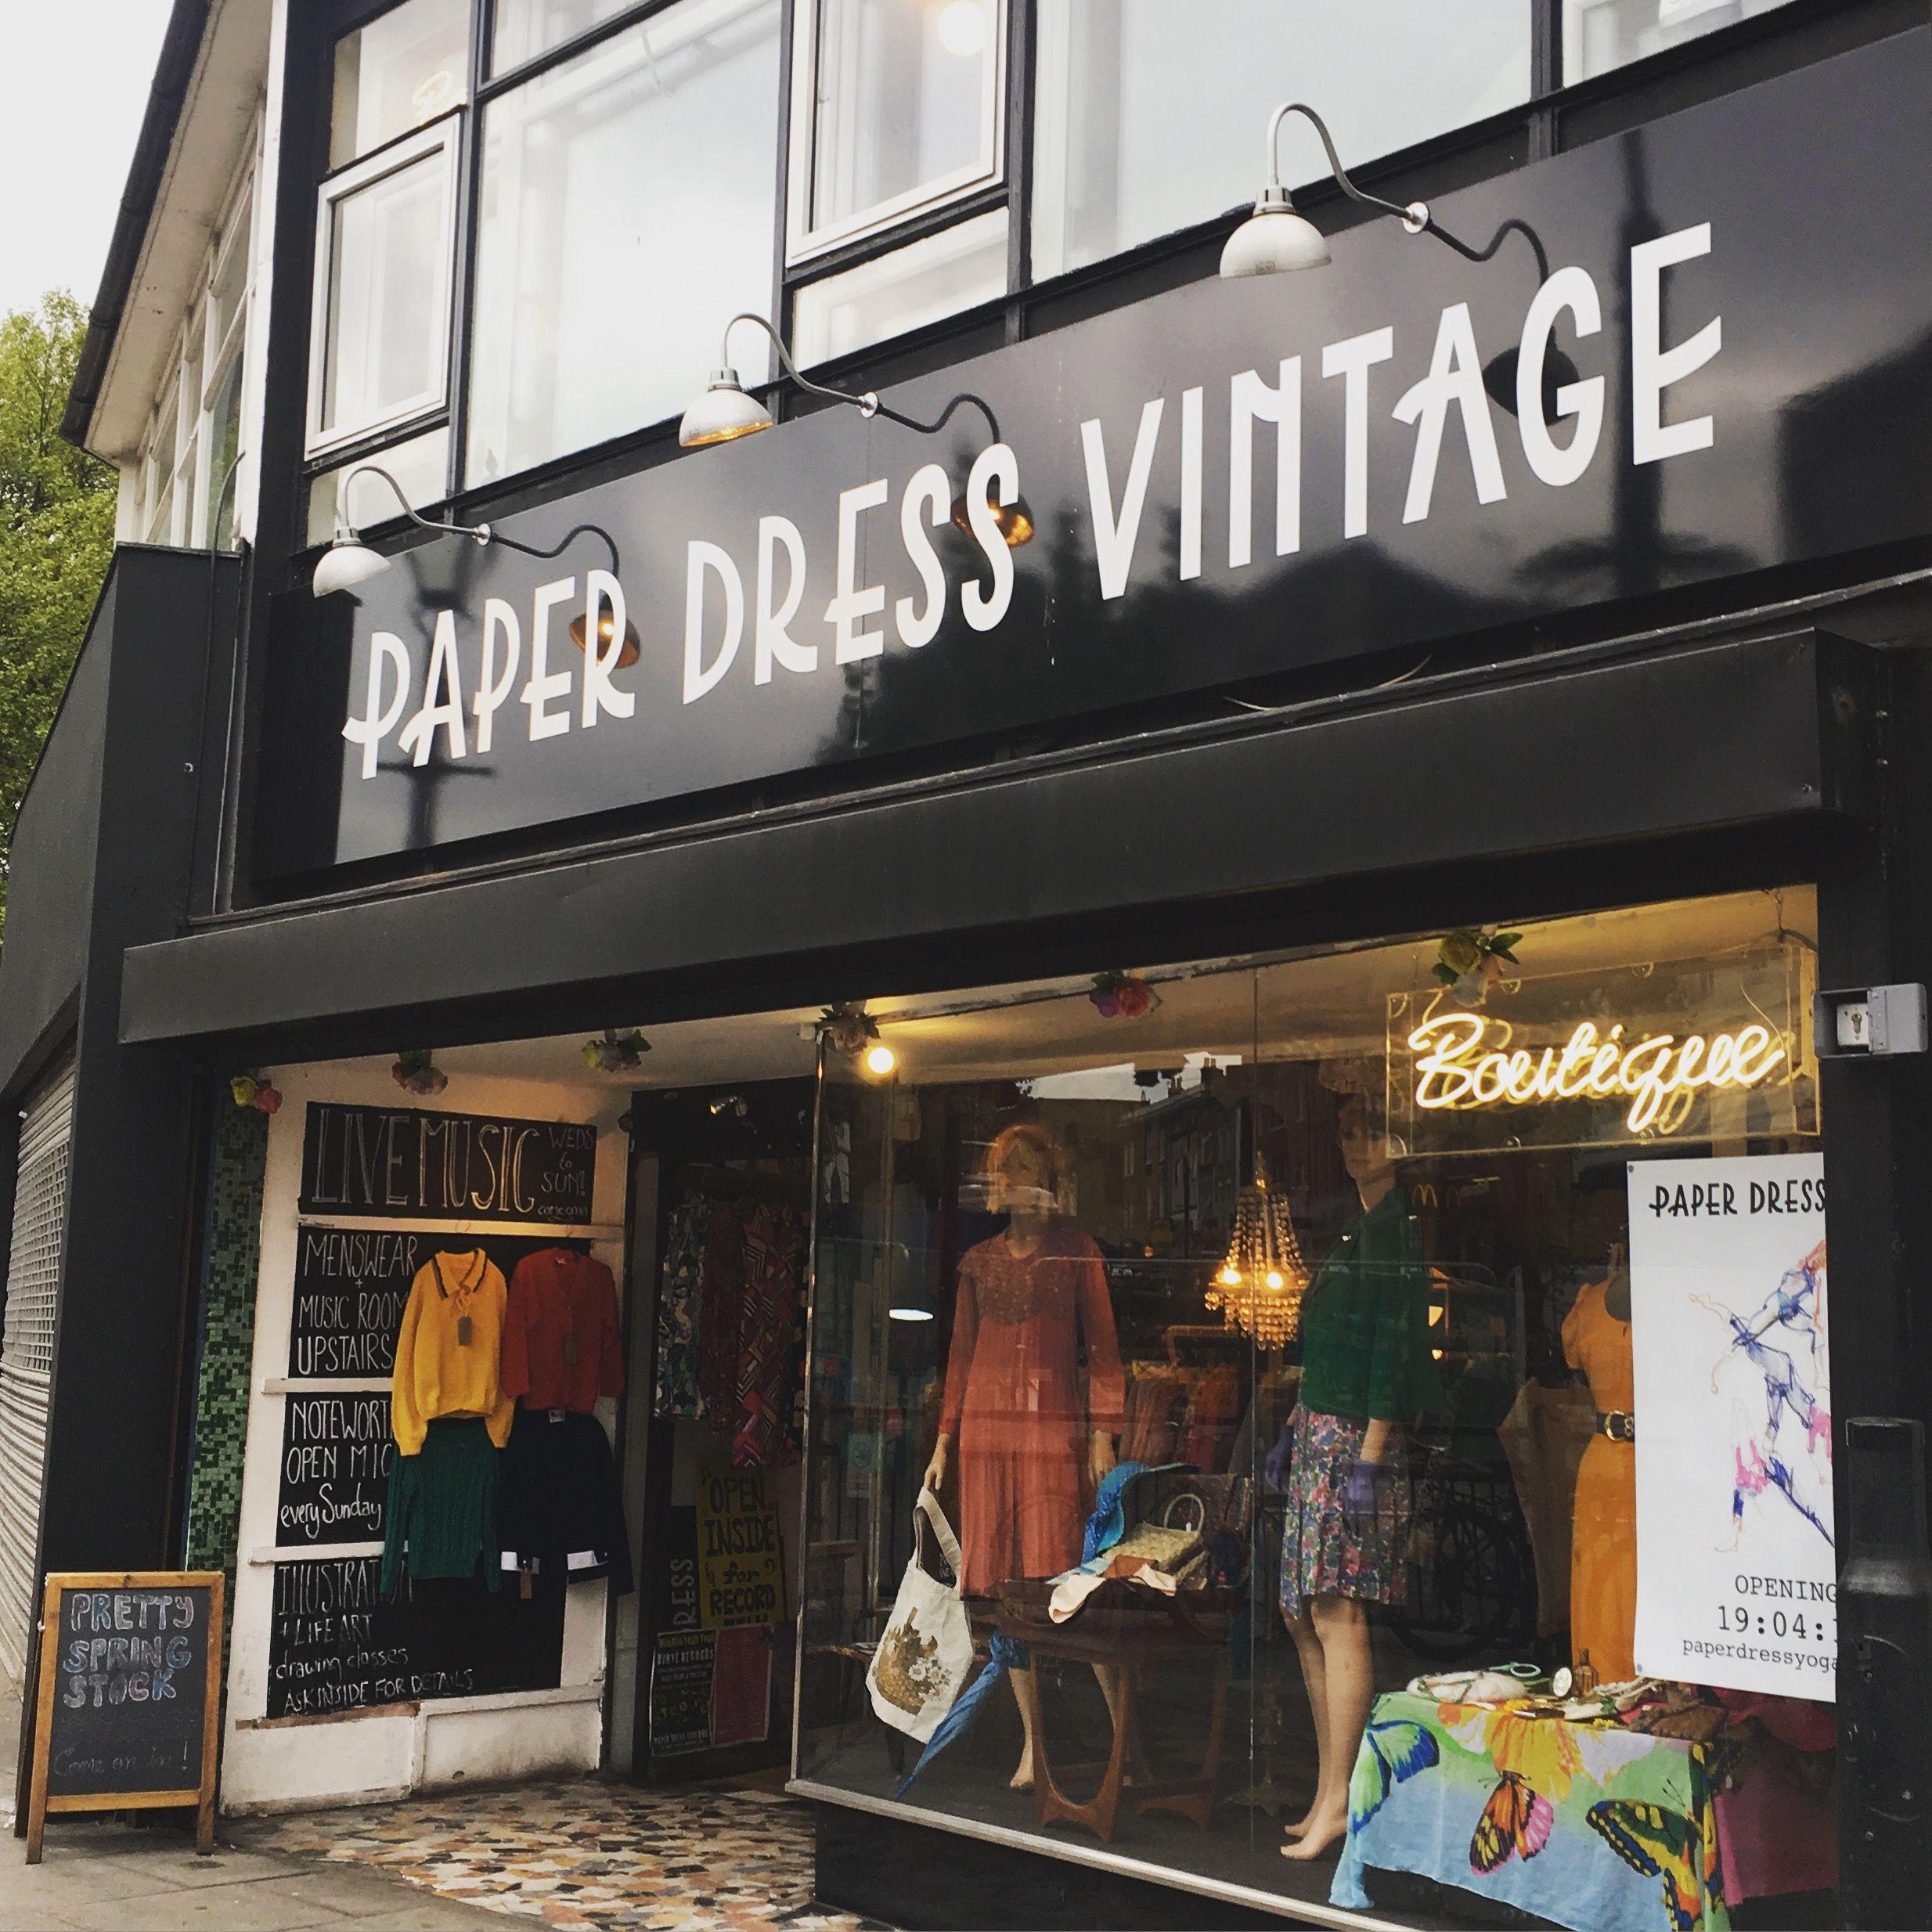 Paper Dress Vintage Hackney London Vintage Clothes Cafe Yoga And Fashion Illustration Classes Hackney London Paper Dress London